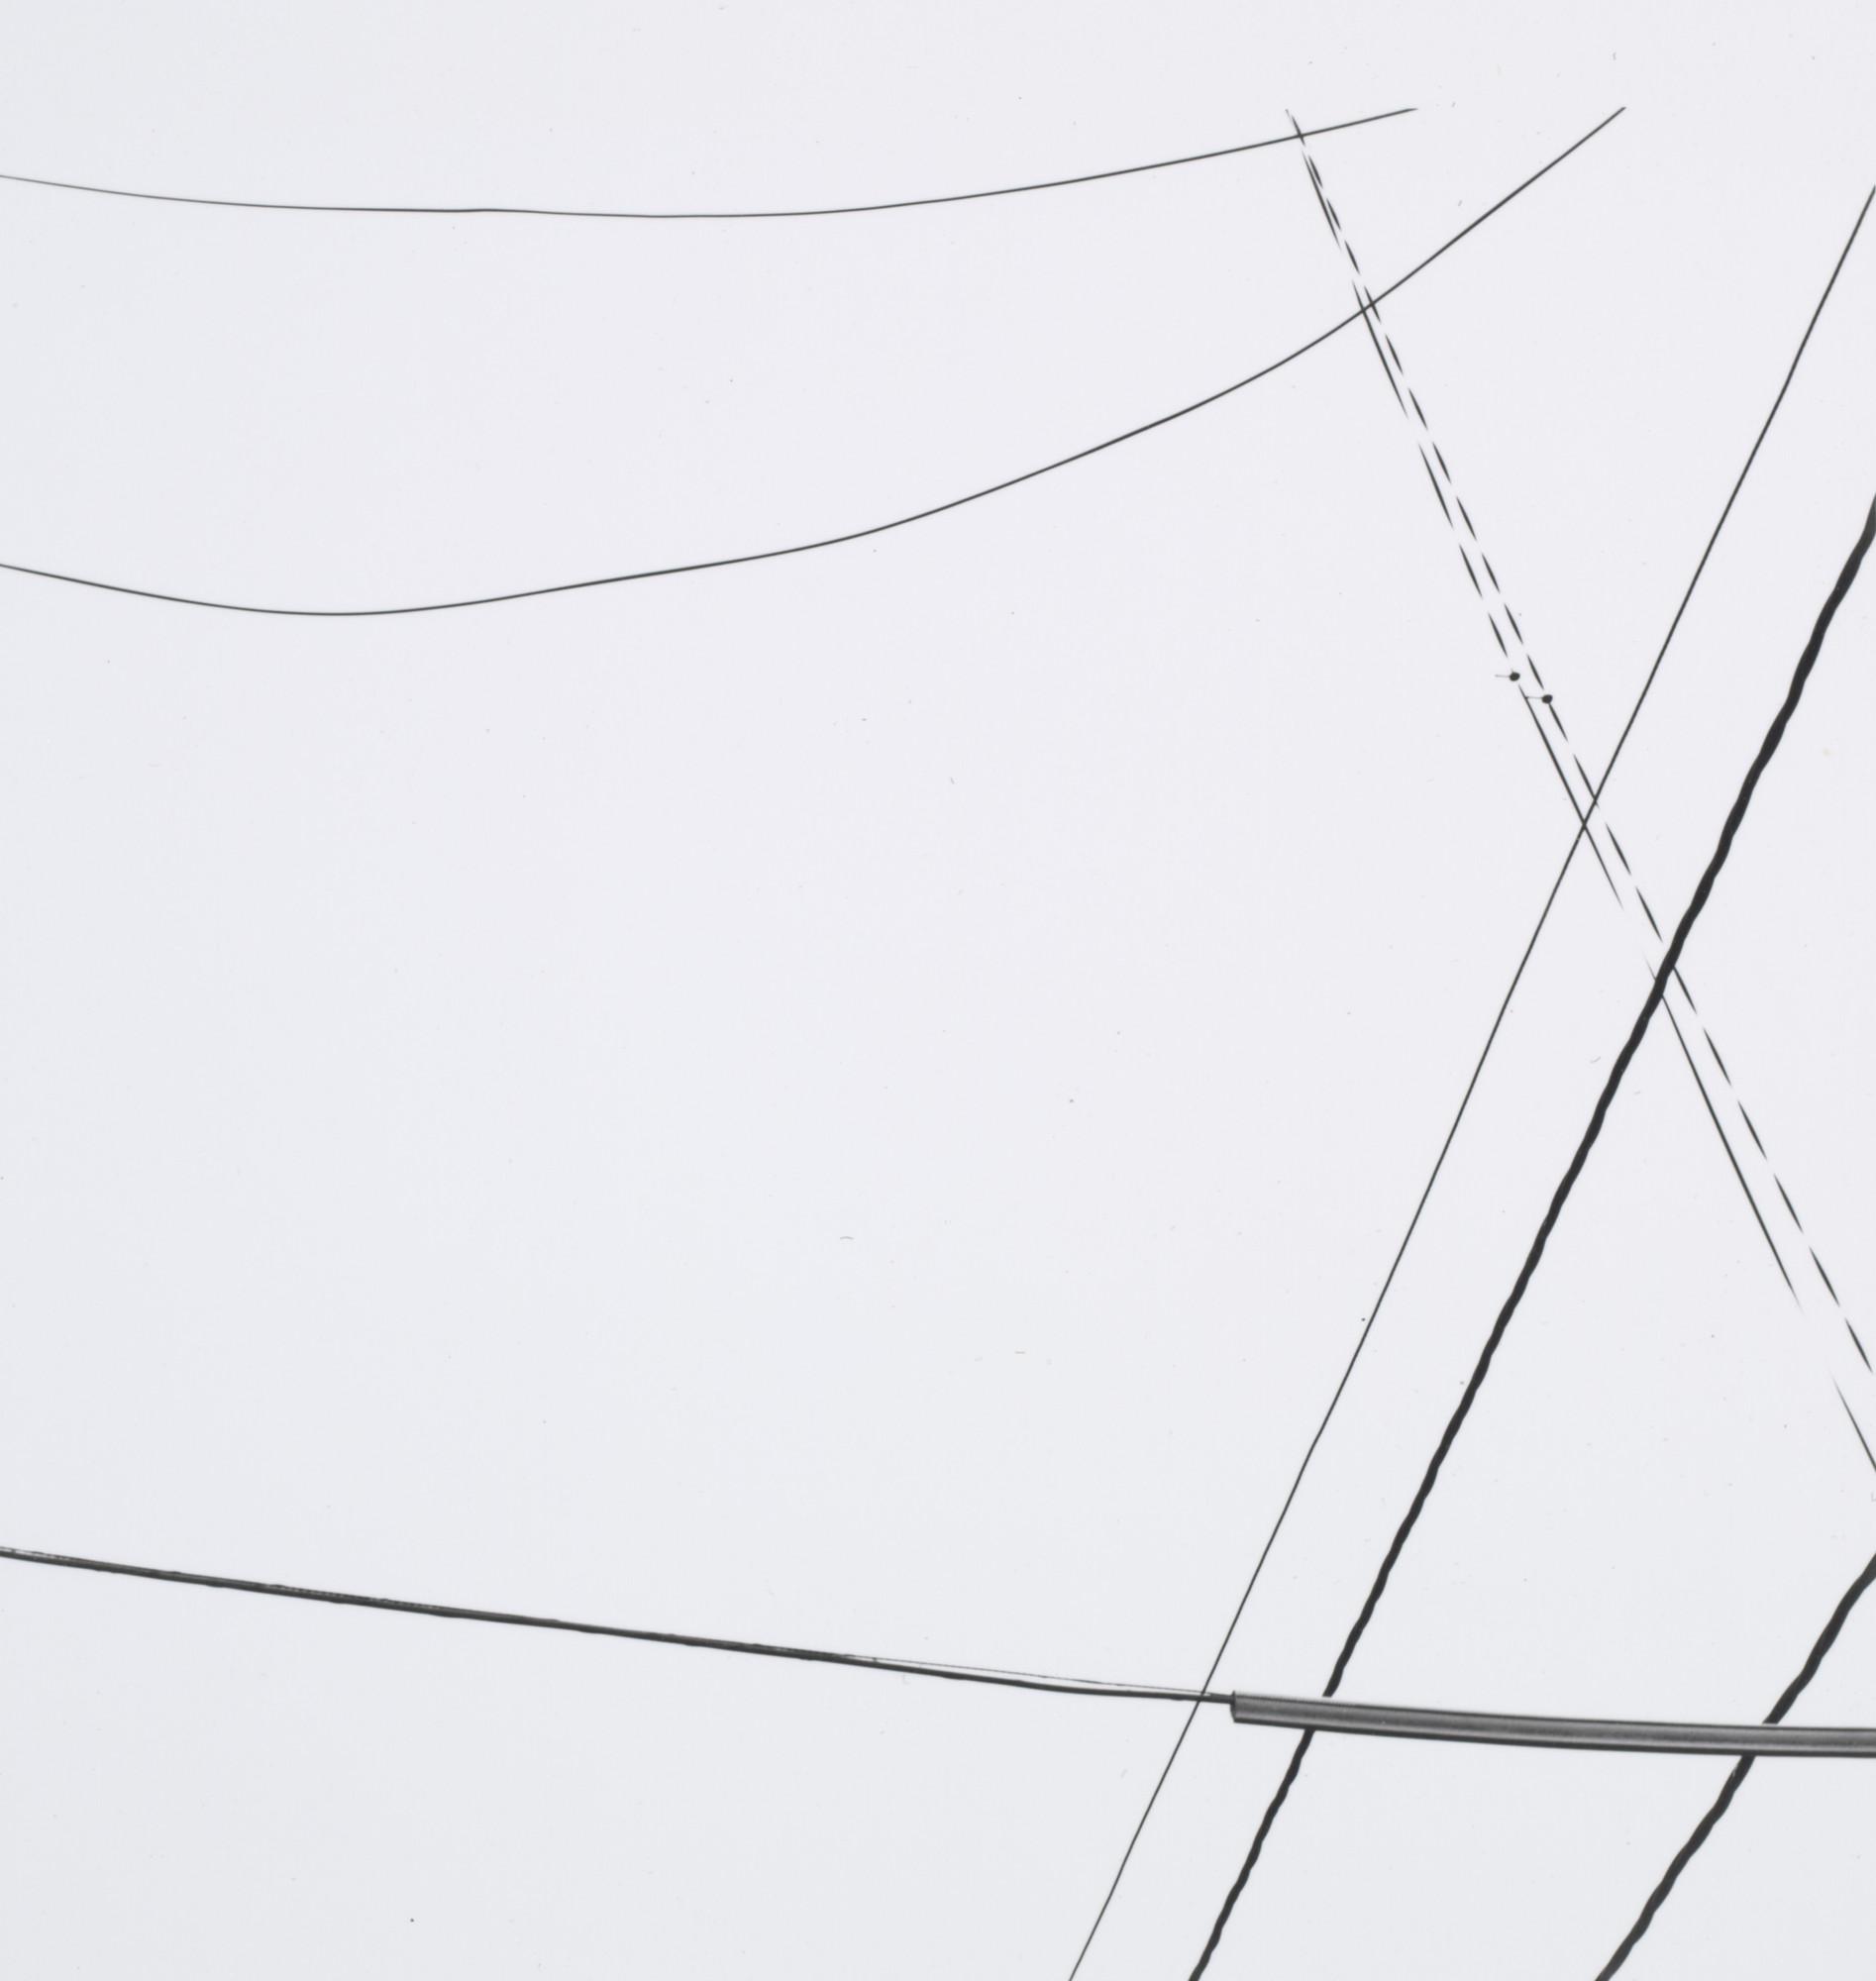 Harry Callahan. Telephone Wires. c. 1945 | MoMA